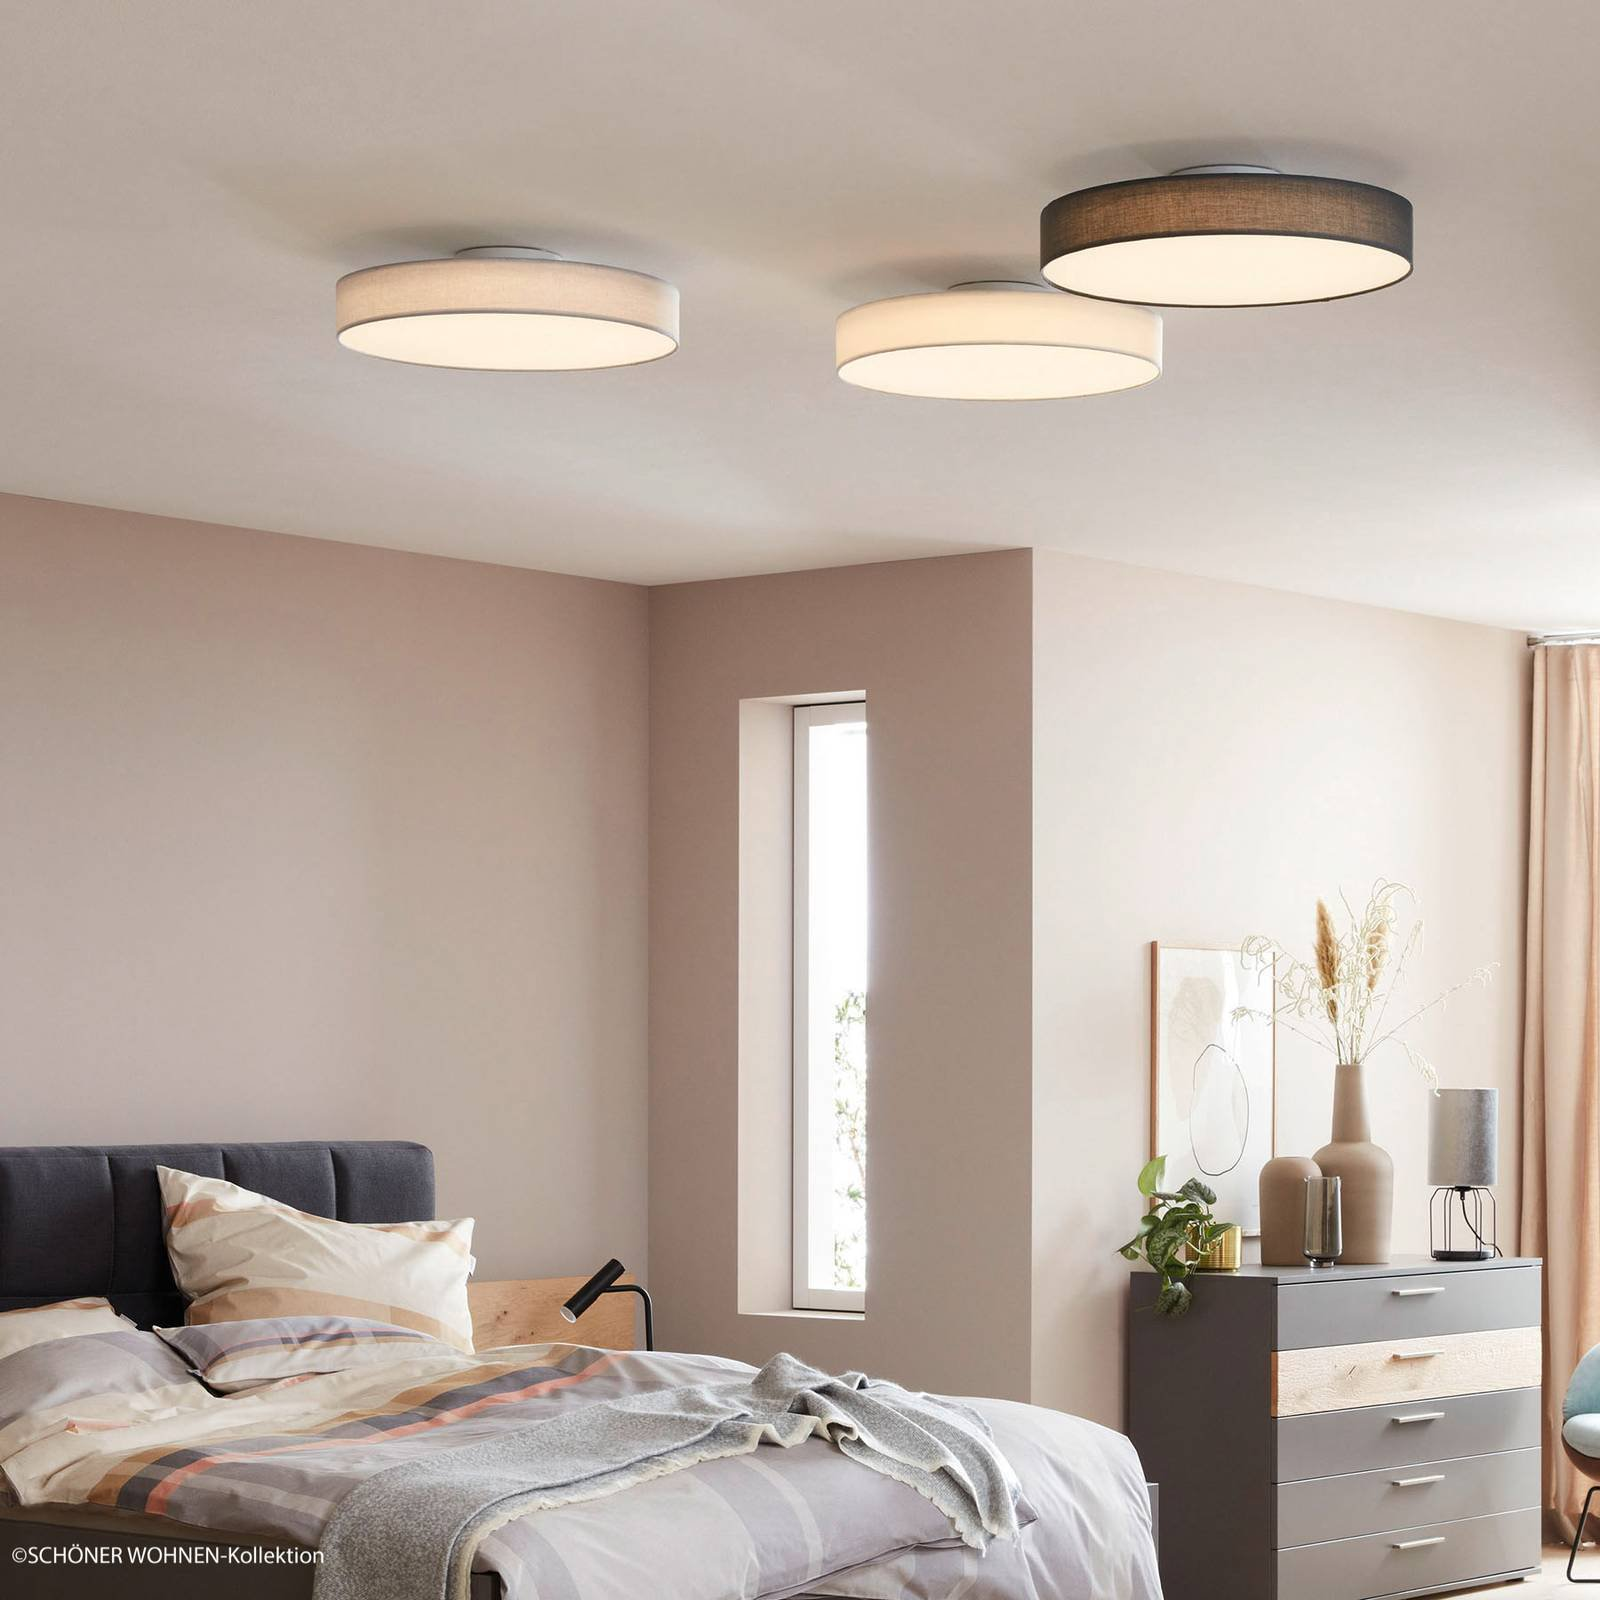 Schöner Wohnen Pina LED-taklampe, mørkegrå